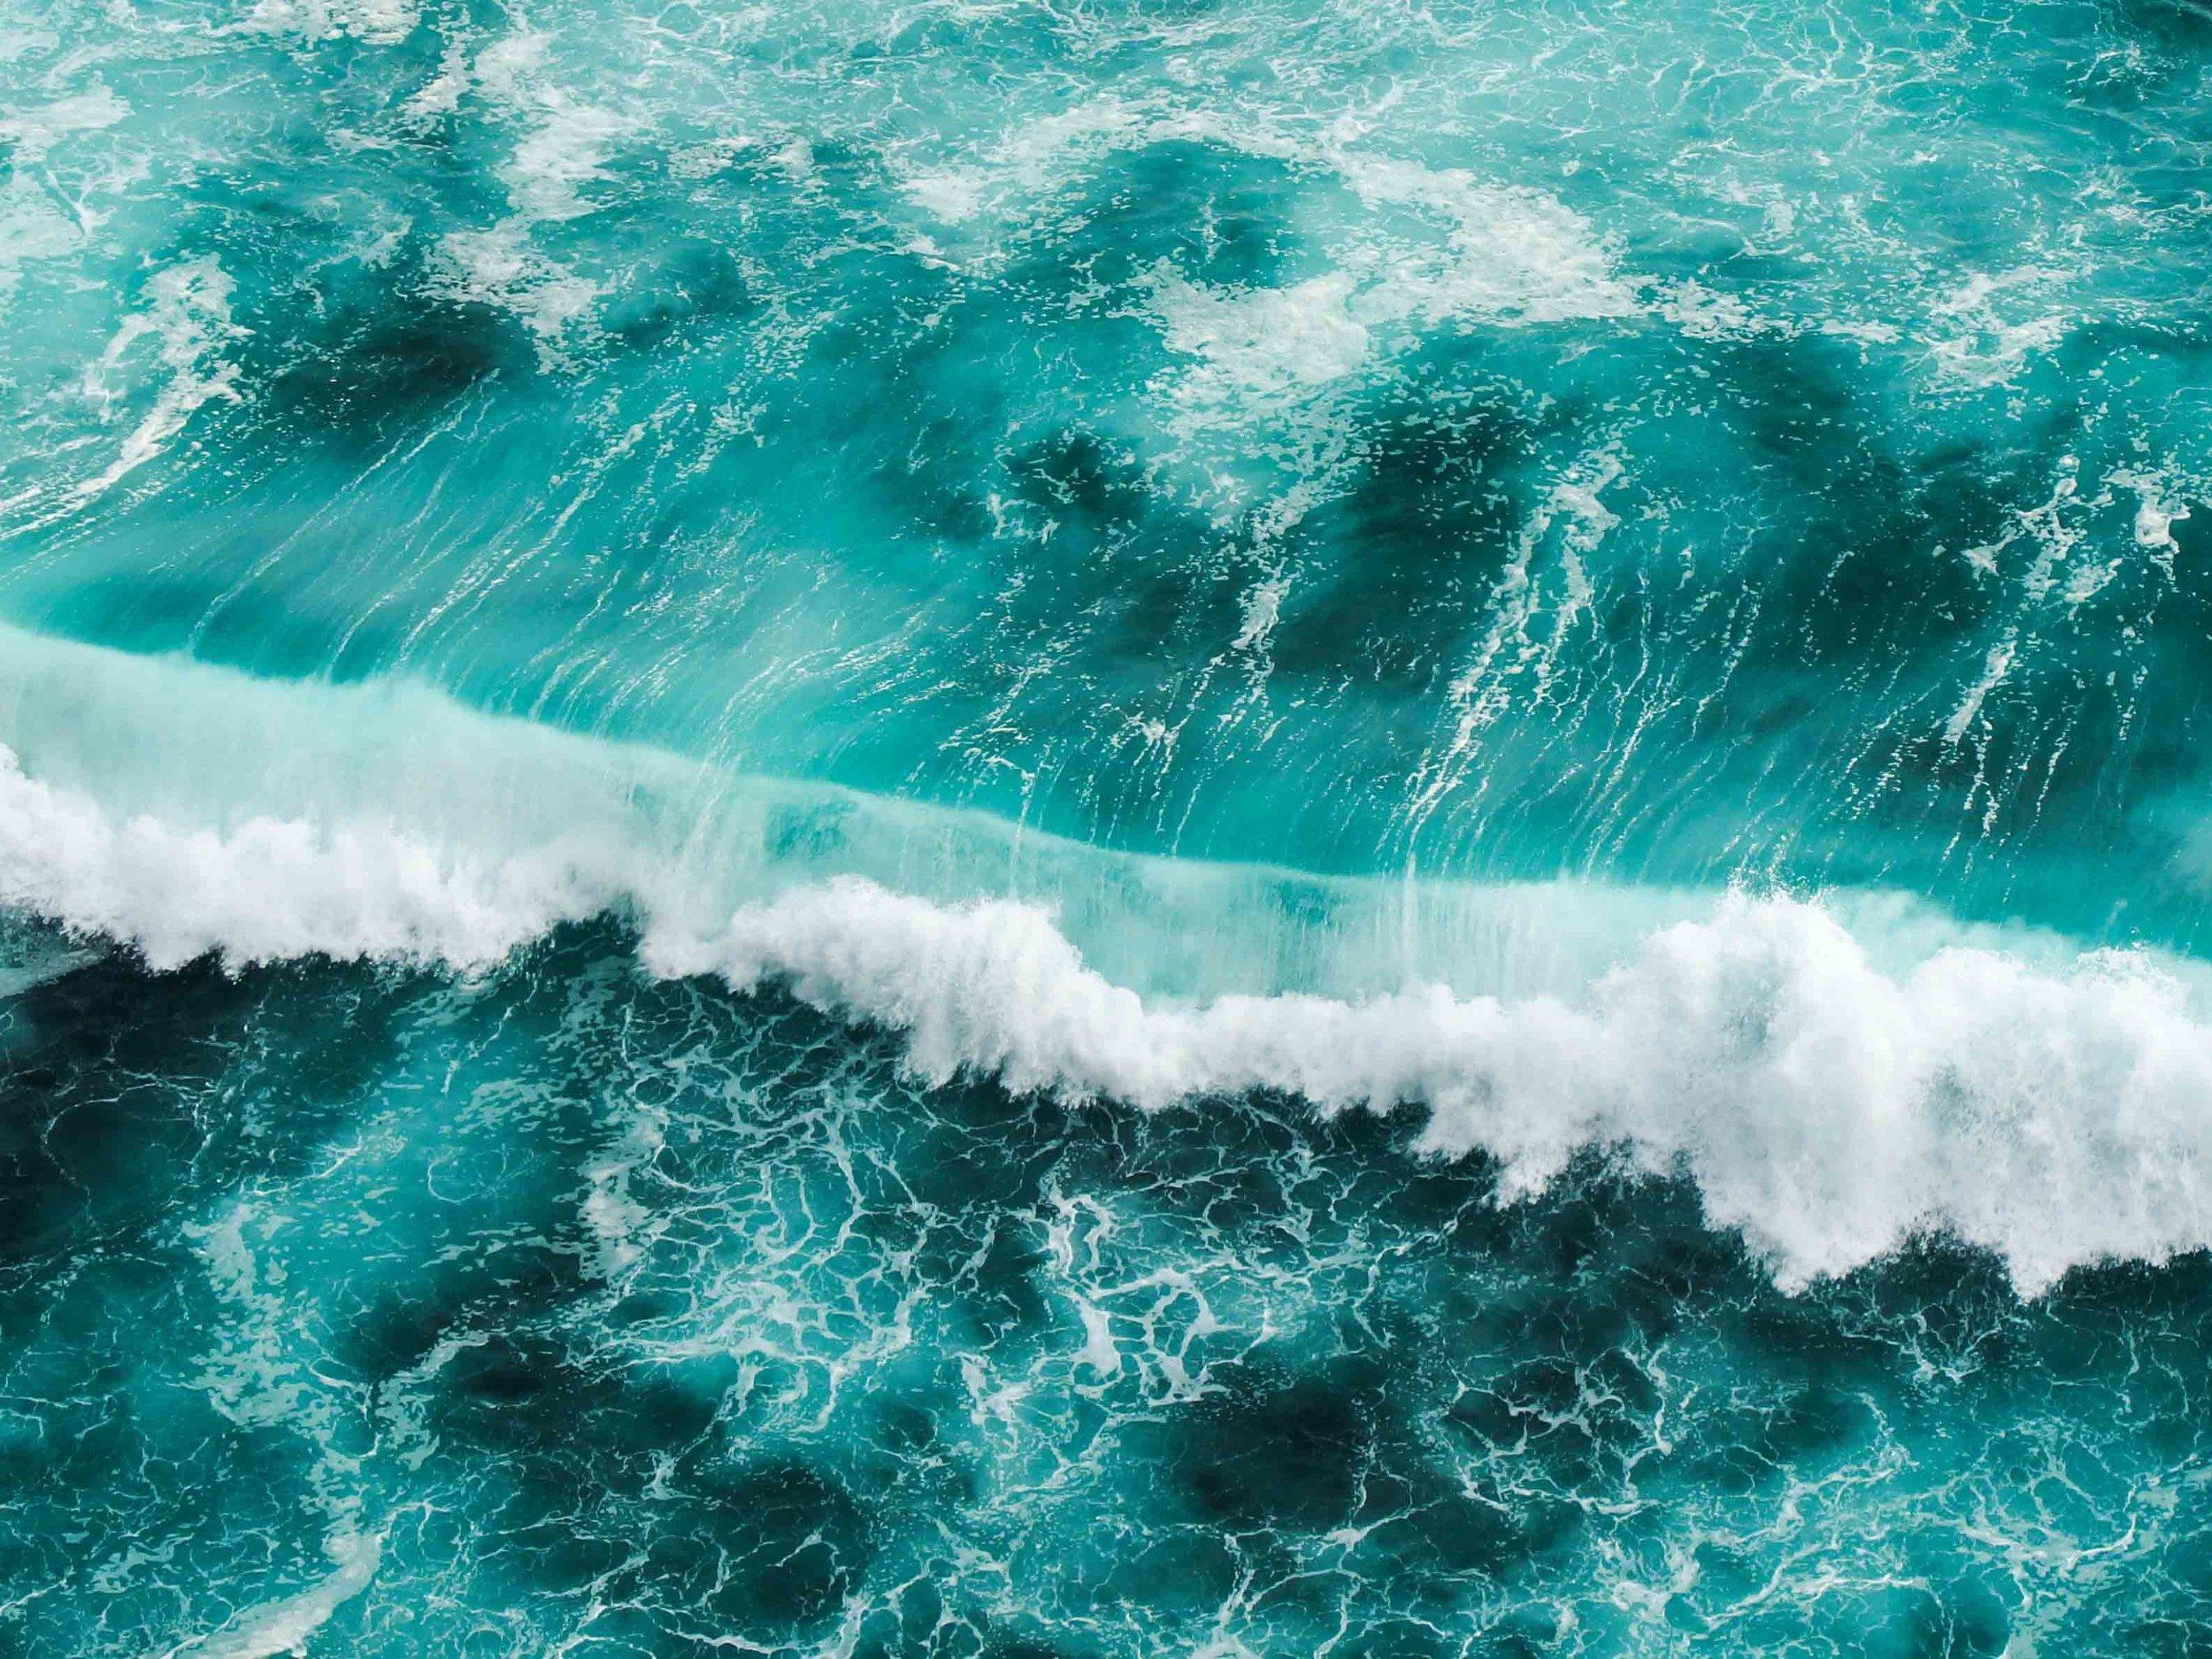 books-about-oceans-book-list-4-3.jpg